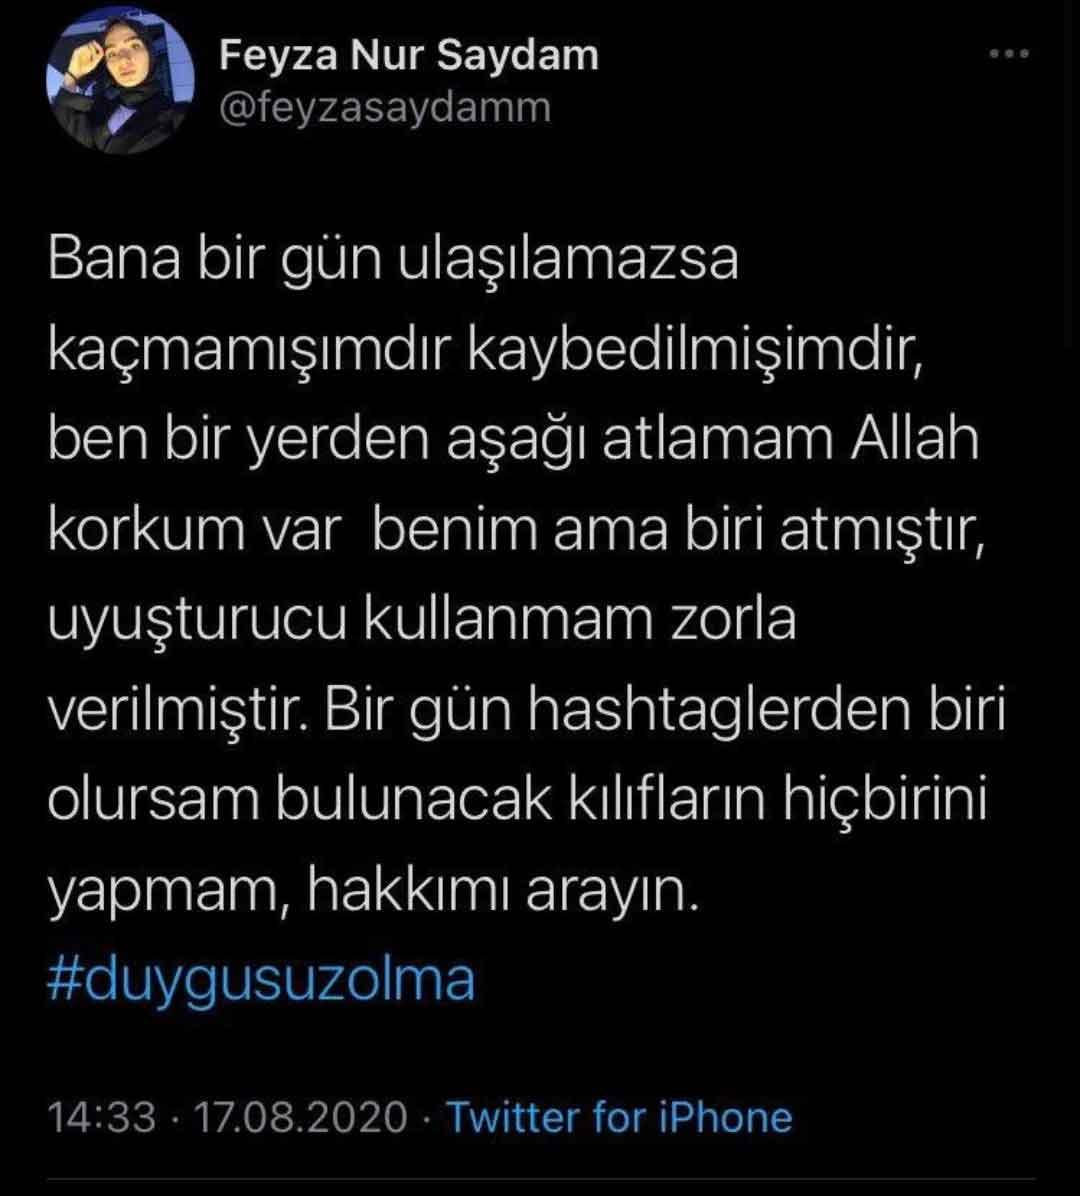 Feyza Nur Saydam